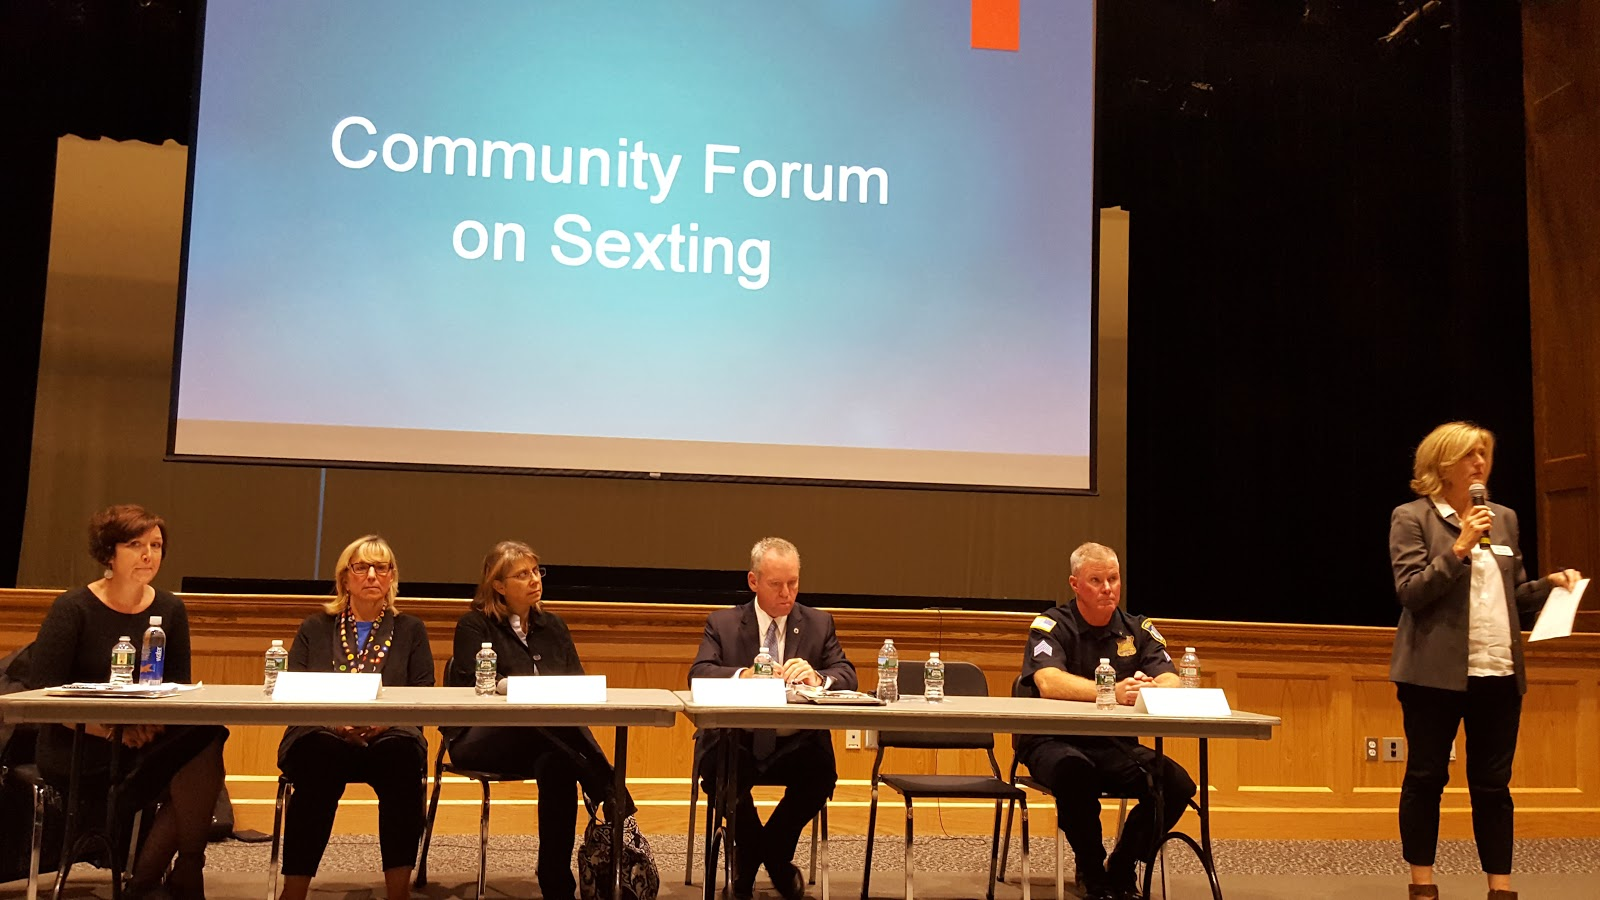 Sexting community